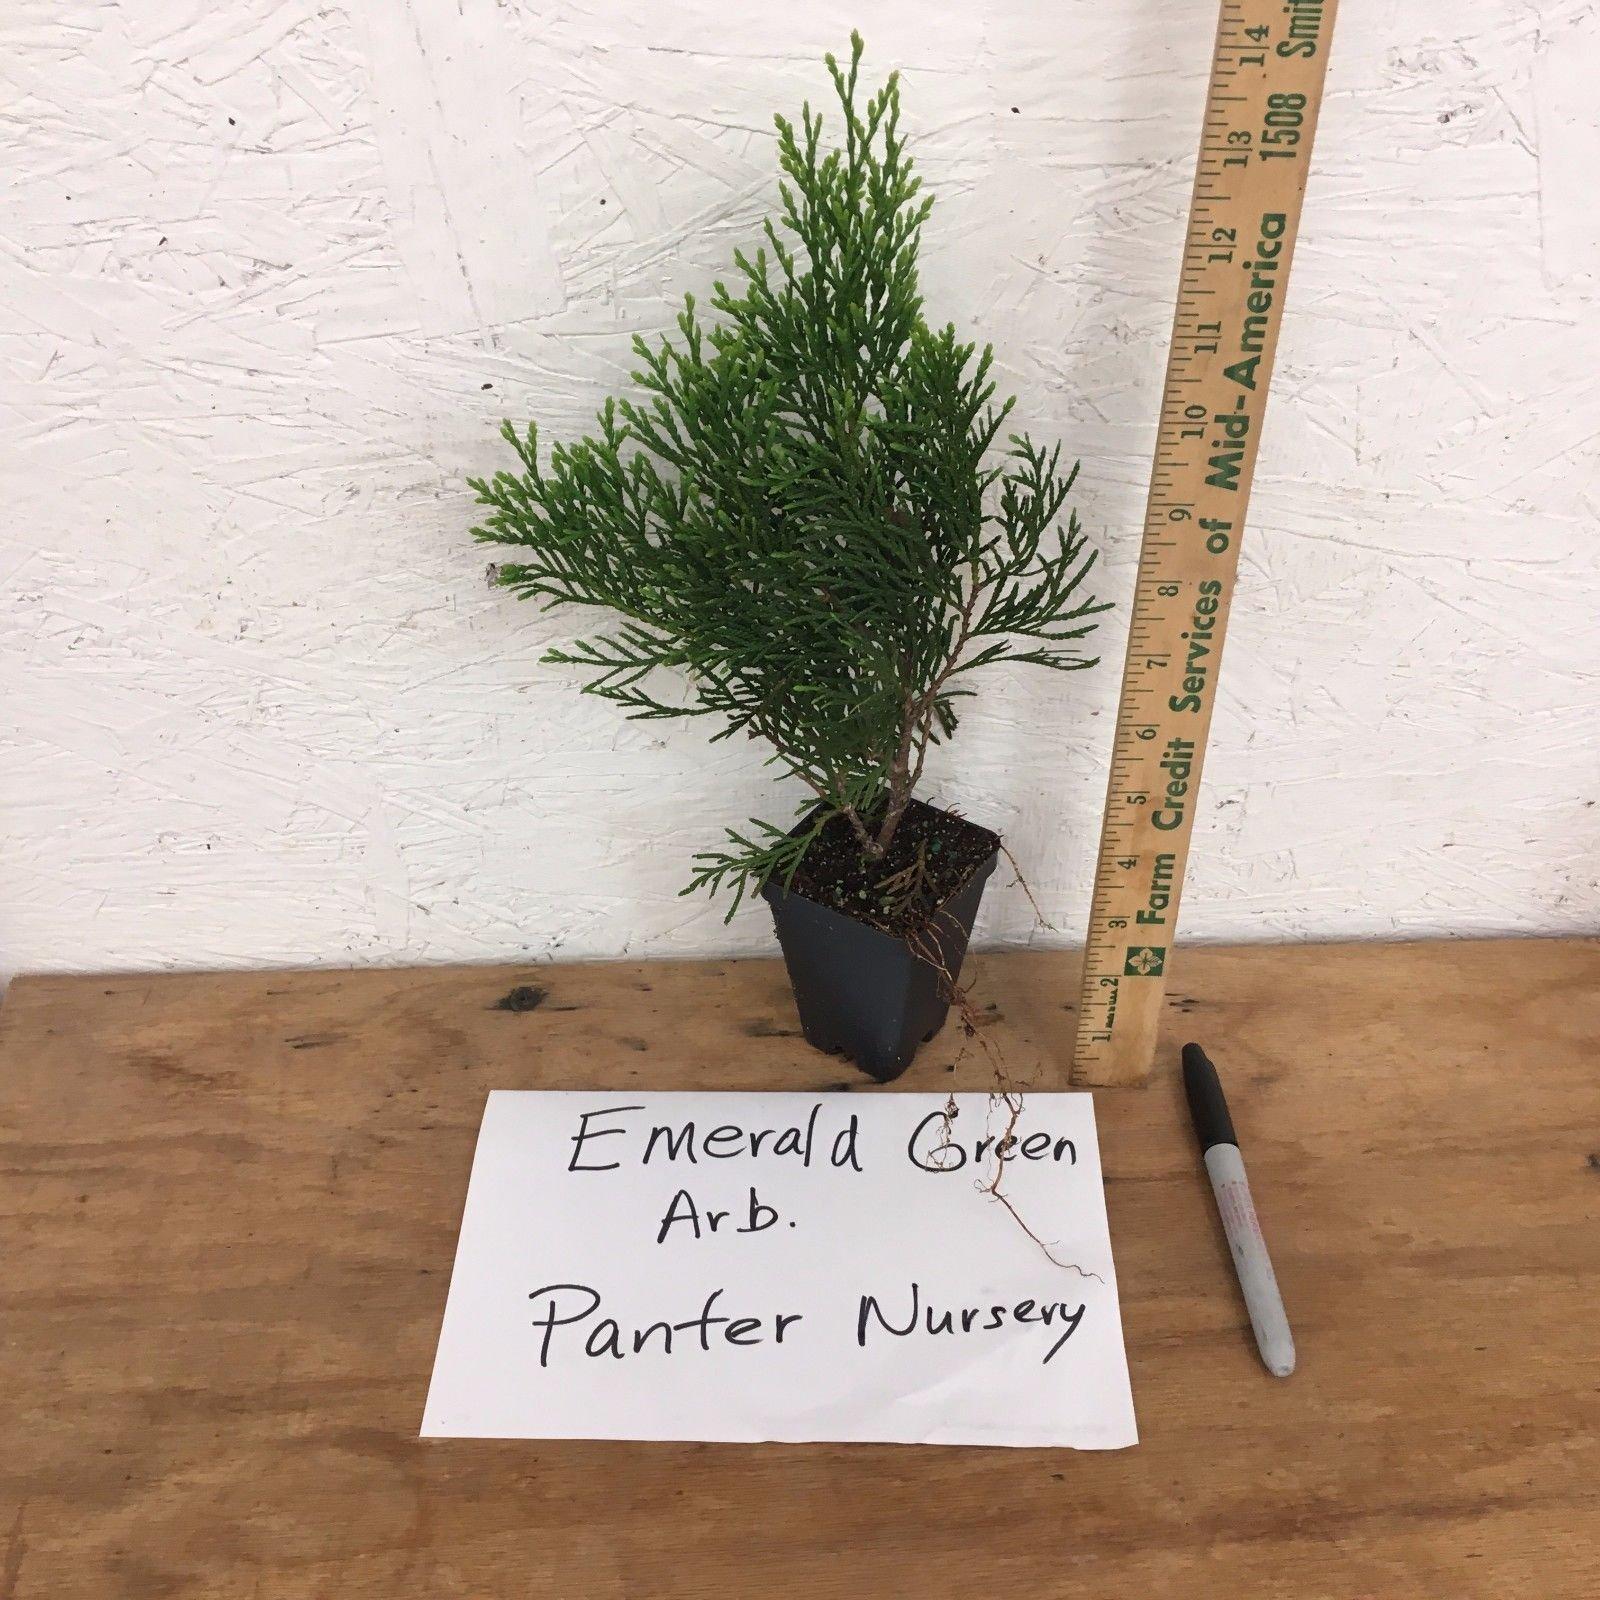 10 EMERALD GREEN Arborvitae (Thuja occidentalis)